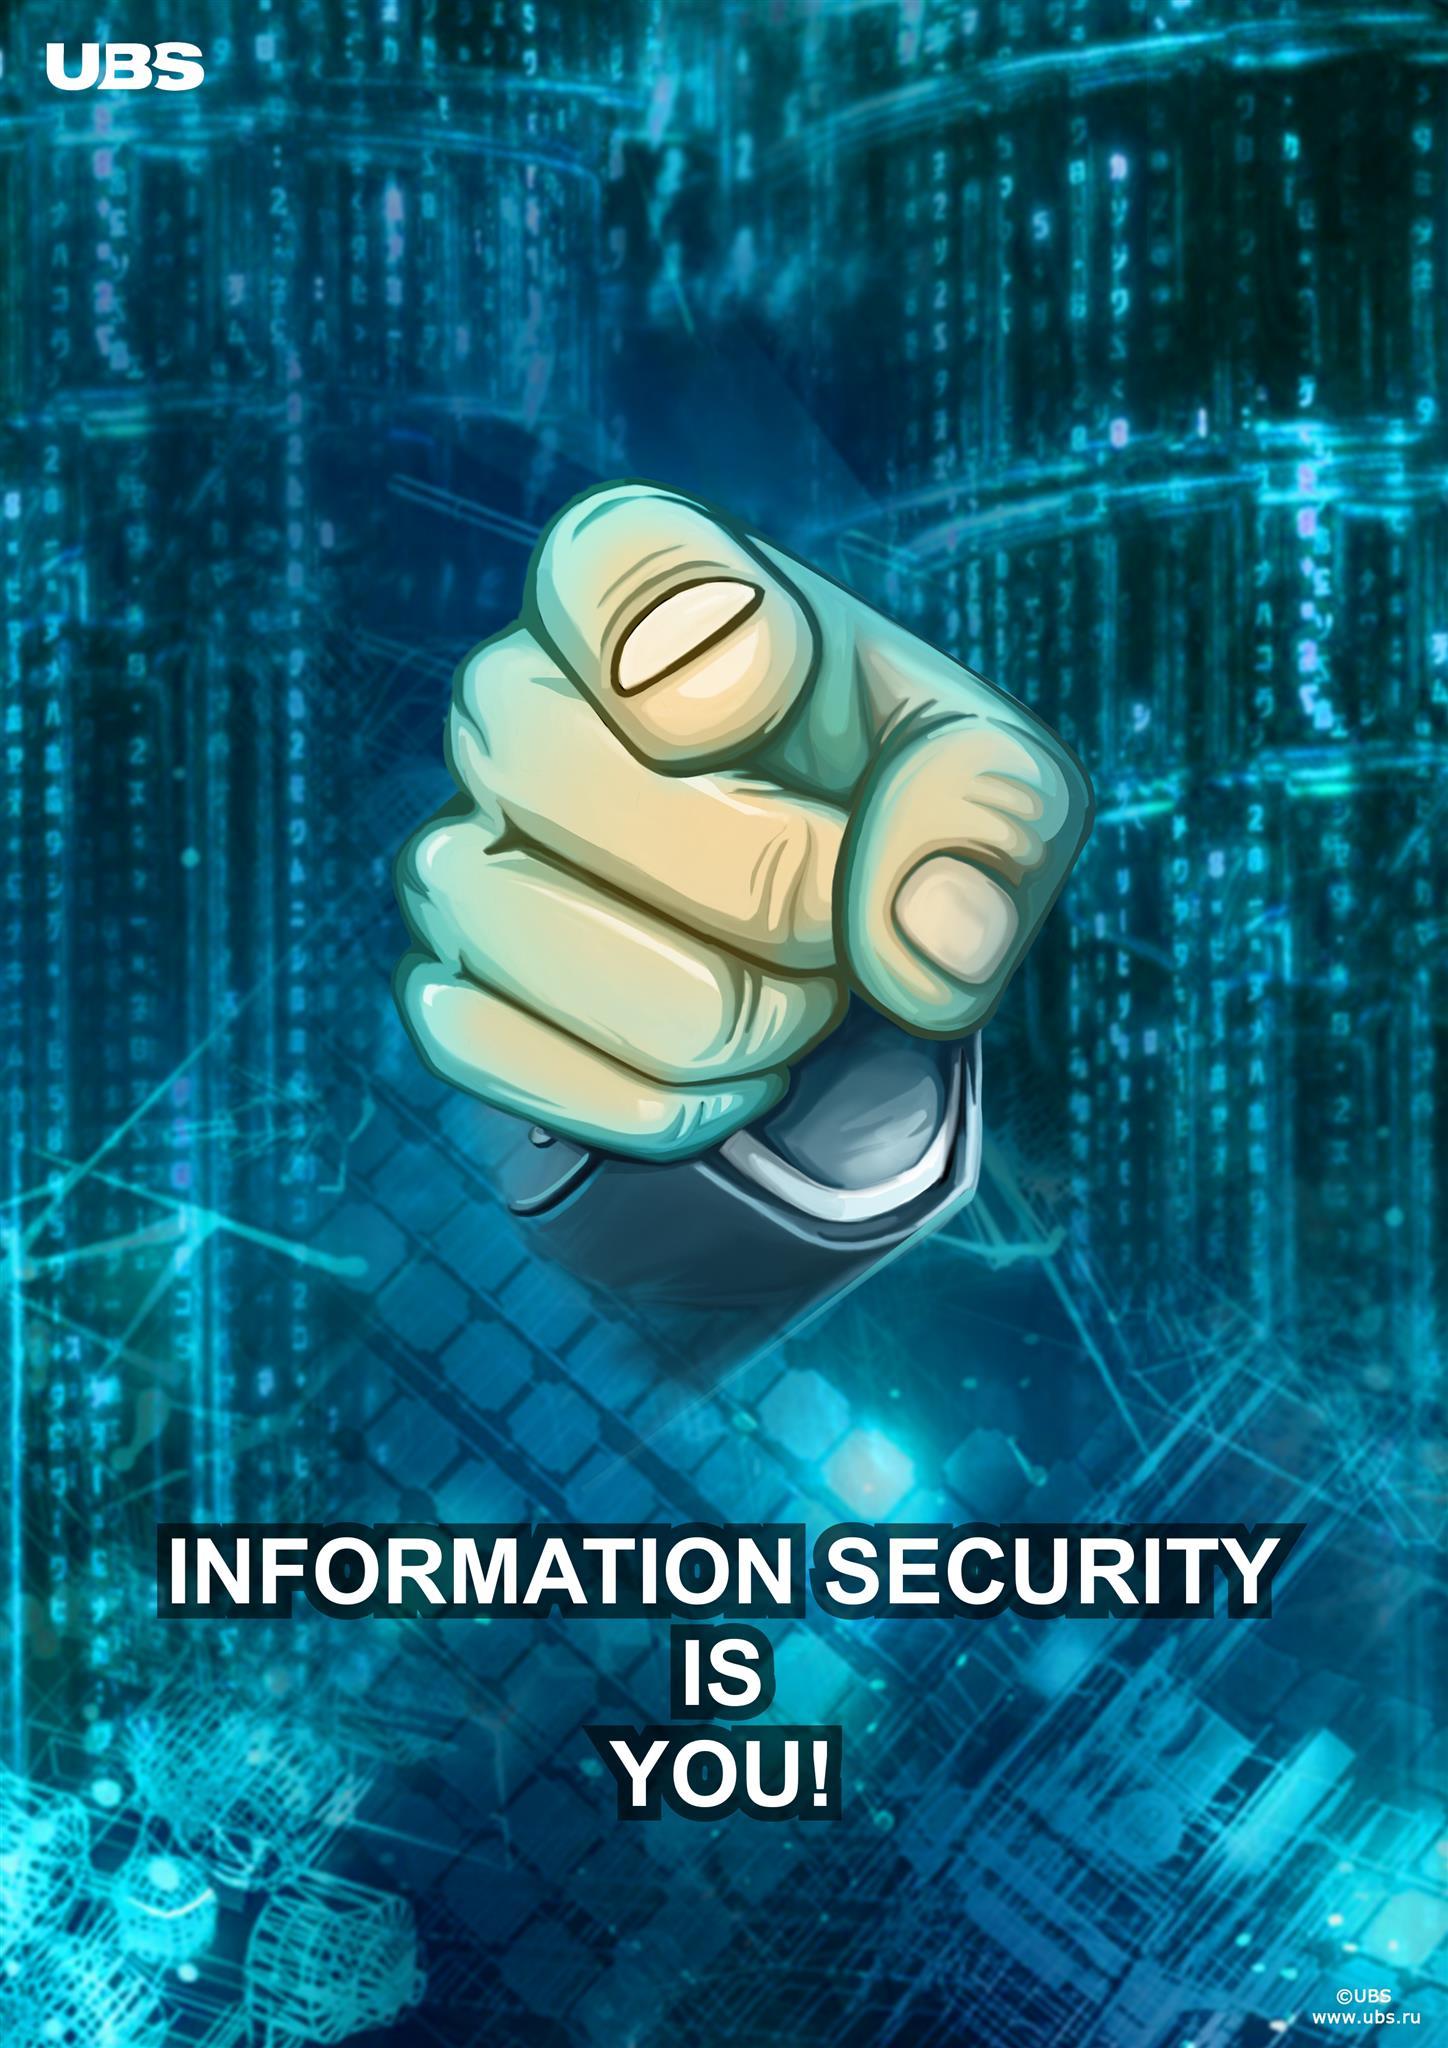 Ubs Smart Cybersecurity Awareness